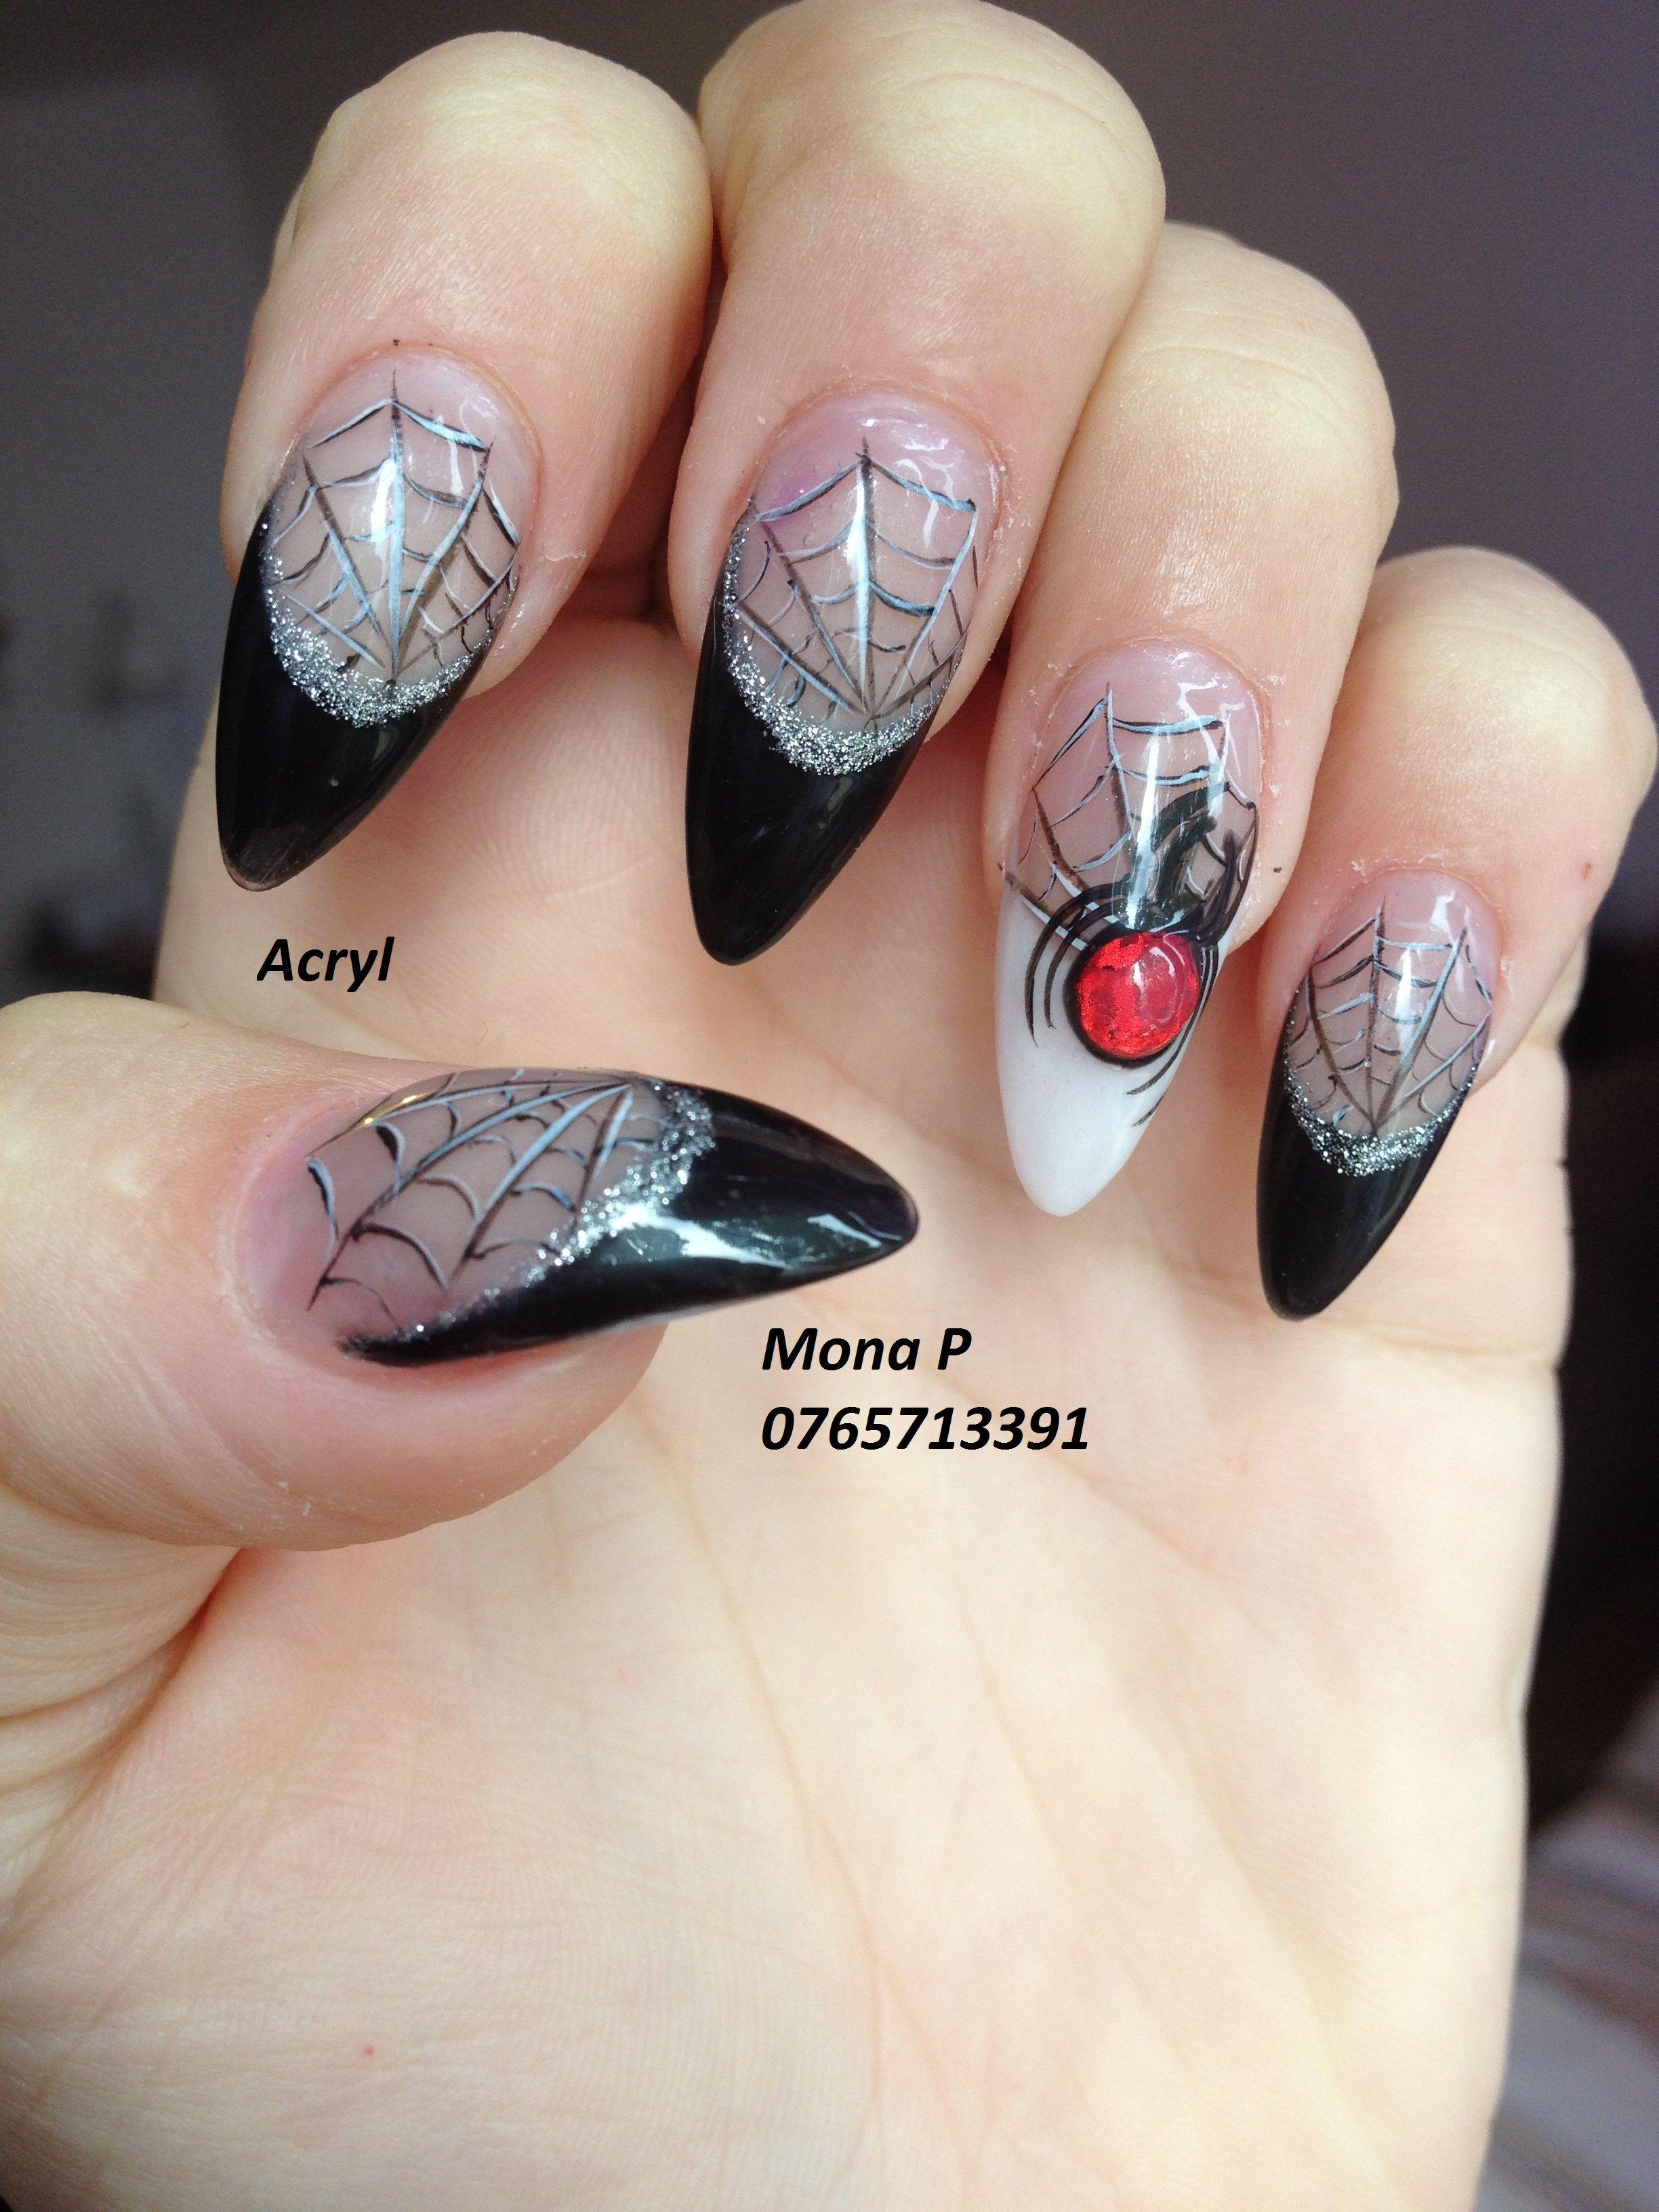 Acrylic halloween and liquid stone nail art nail art by mona p acrylic halloween and liquid stone nail art prinsesfo Image collections